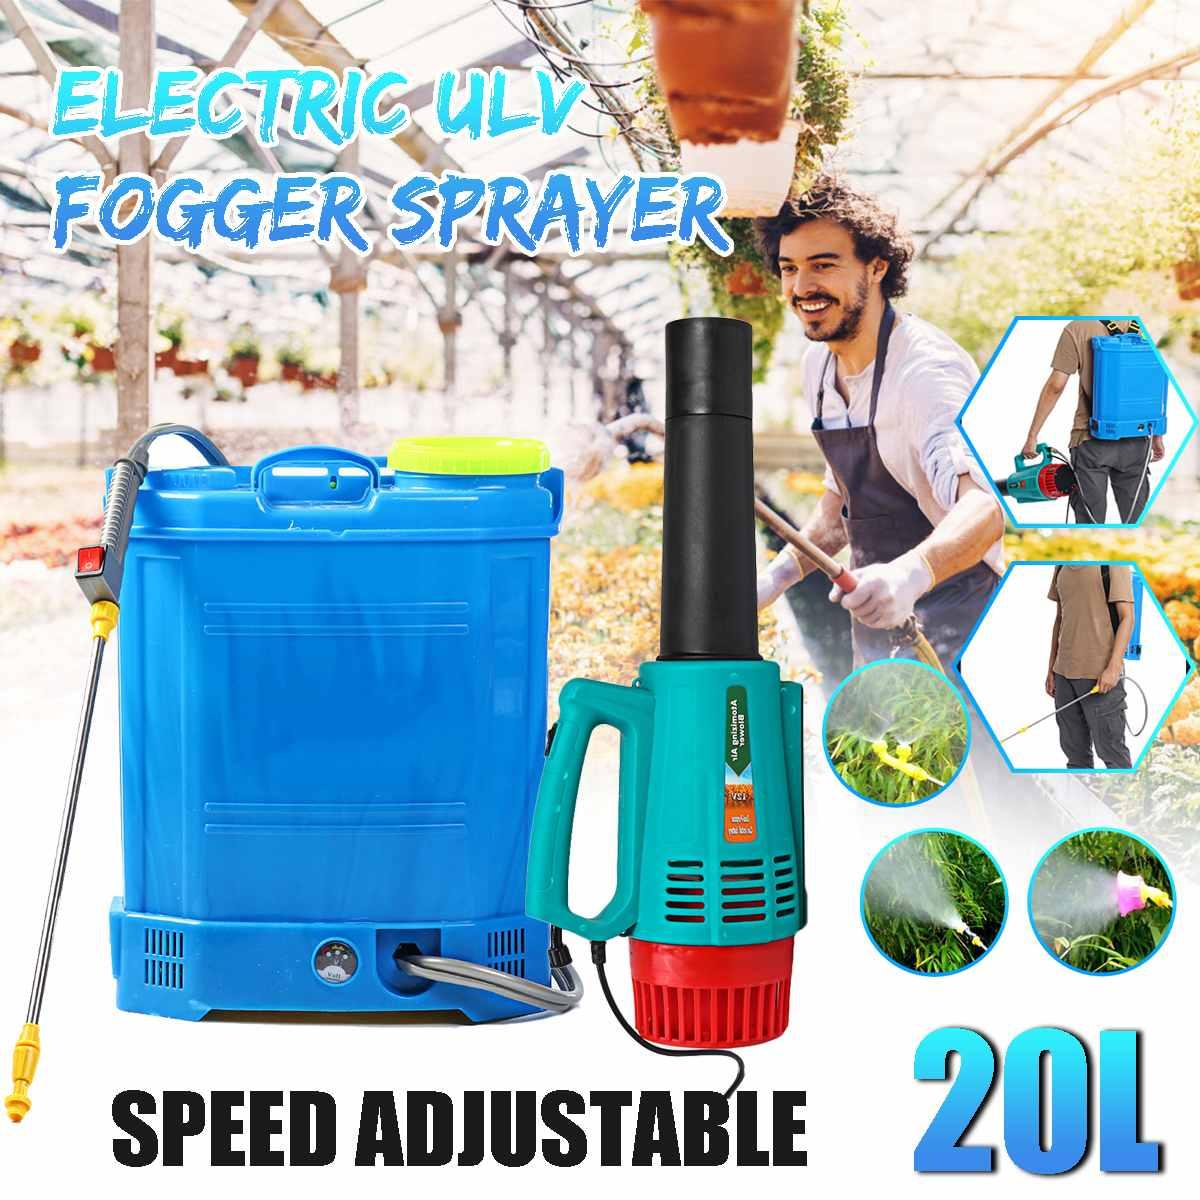 20L Electric Sprayer Intelligent Agricultural Pesticide dispenser Garden equipment 220V Rechargeable Lead acid battery-0